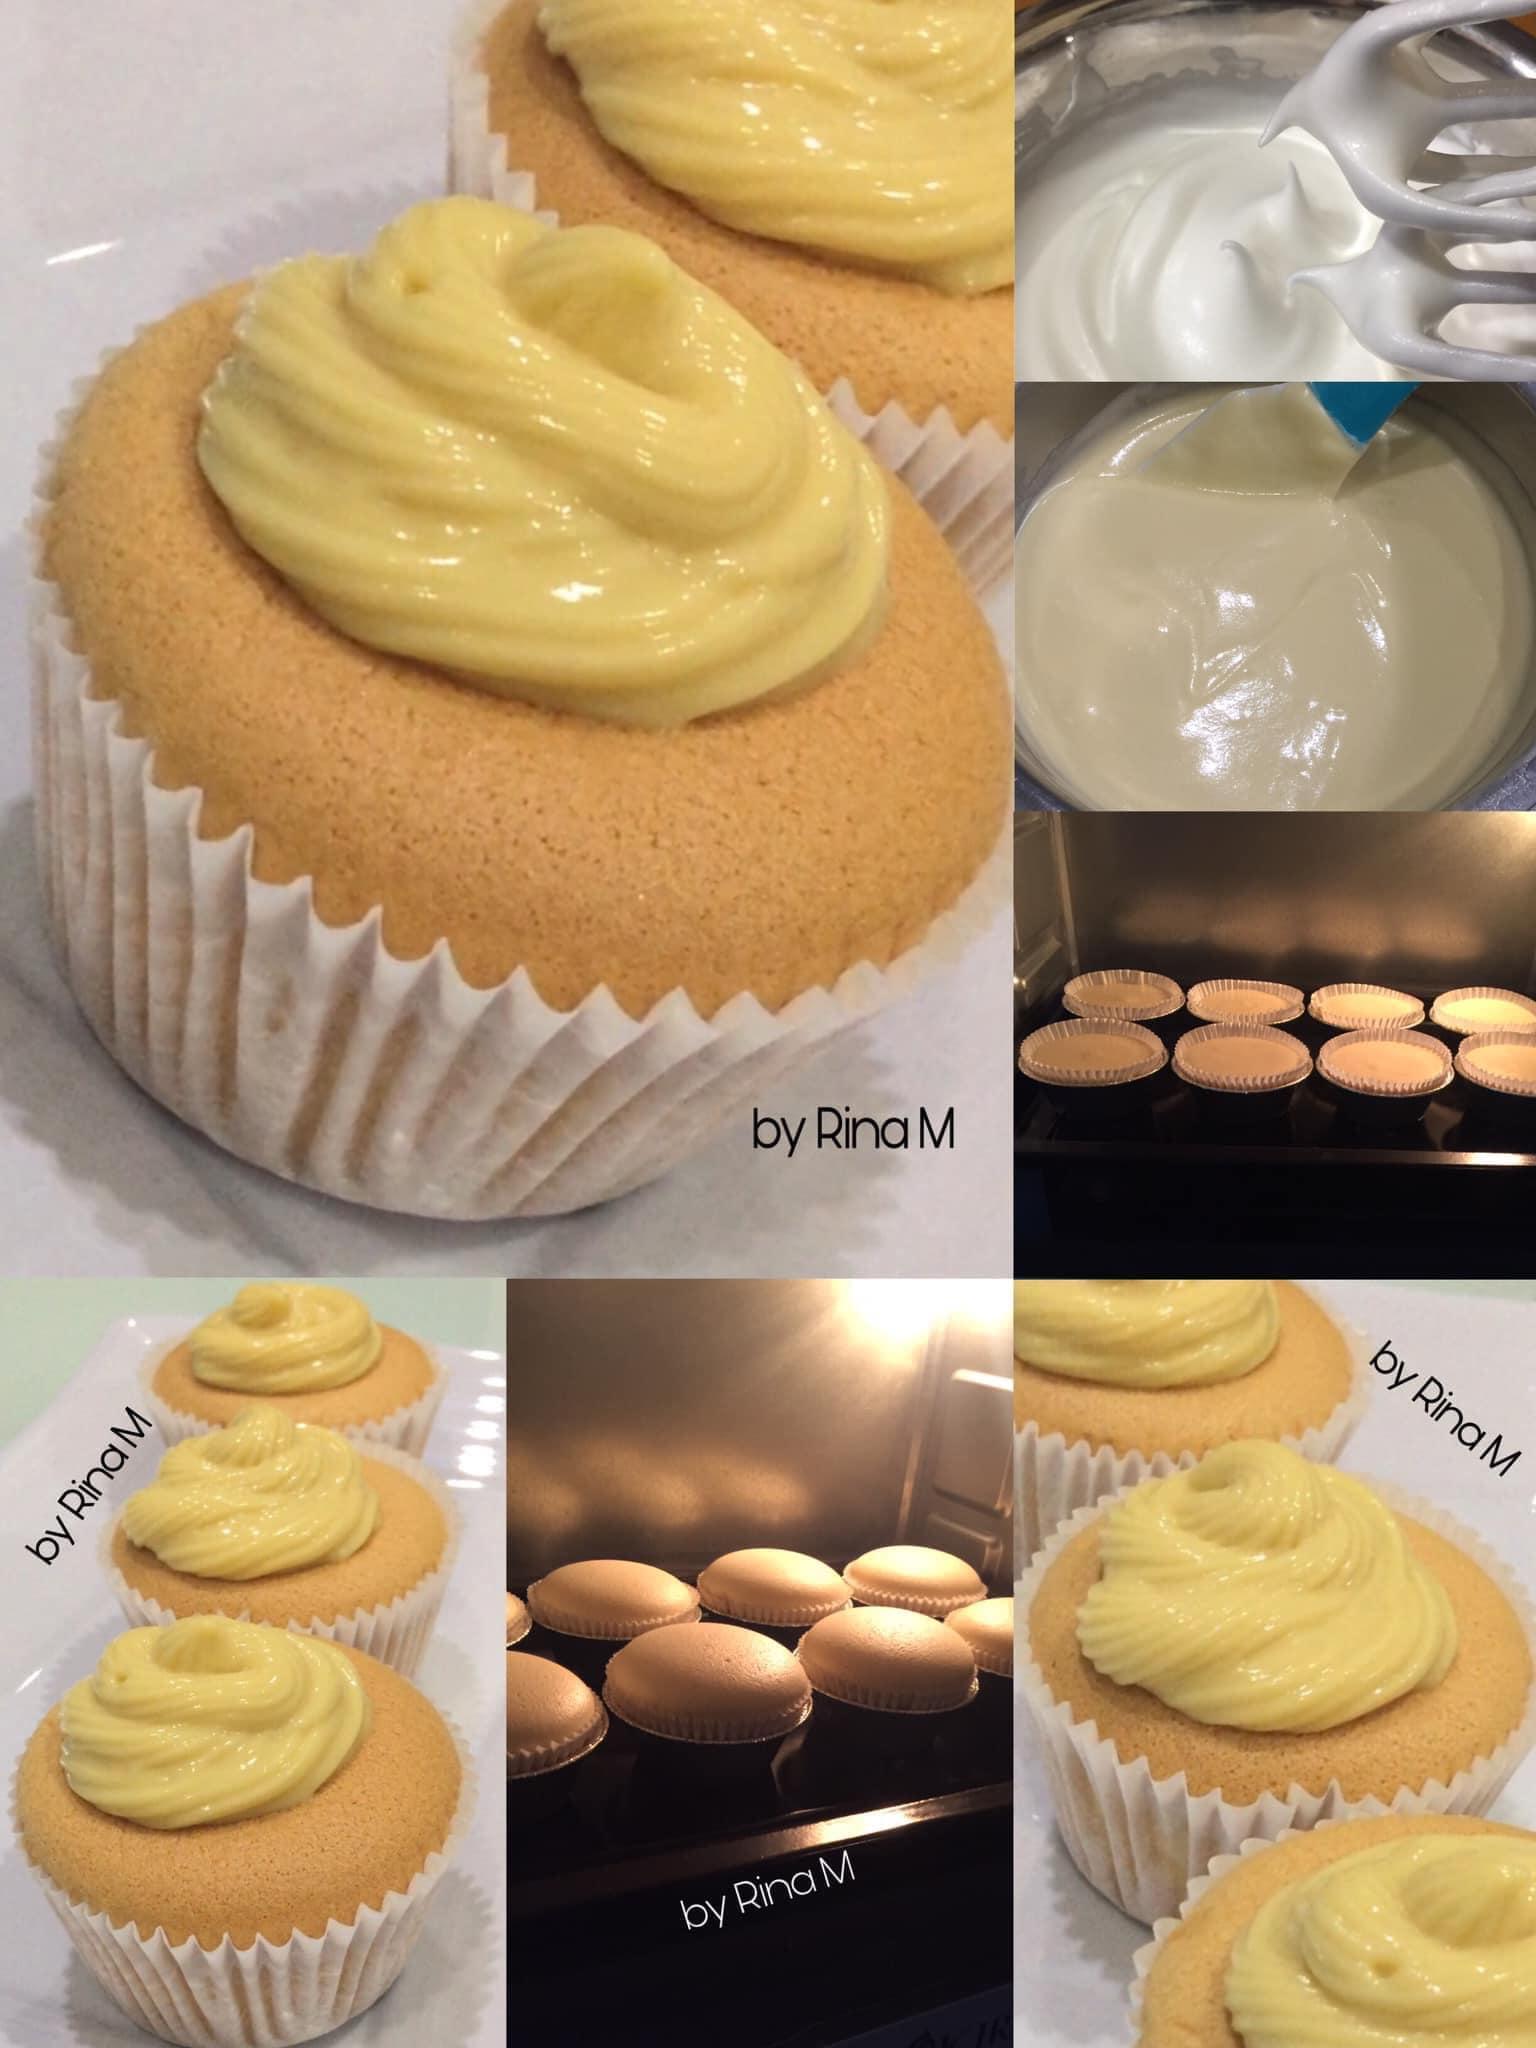 resep Condensed Milk Cupcakes by Rina M